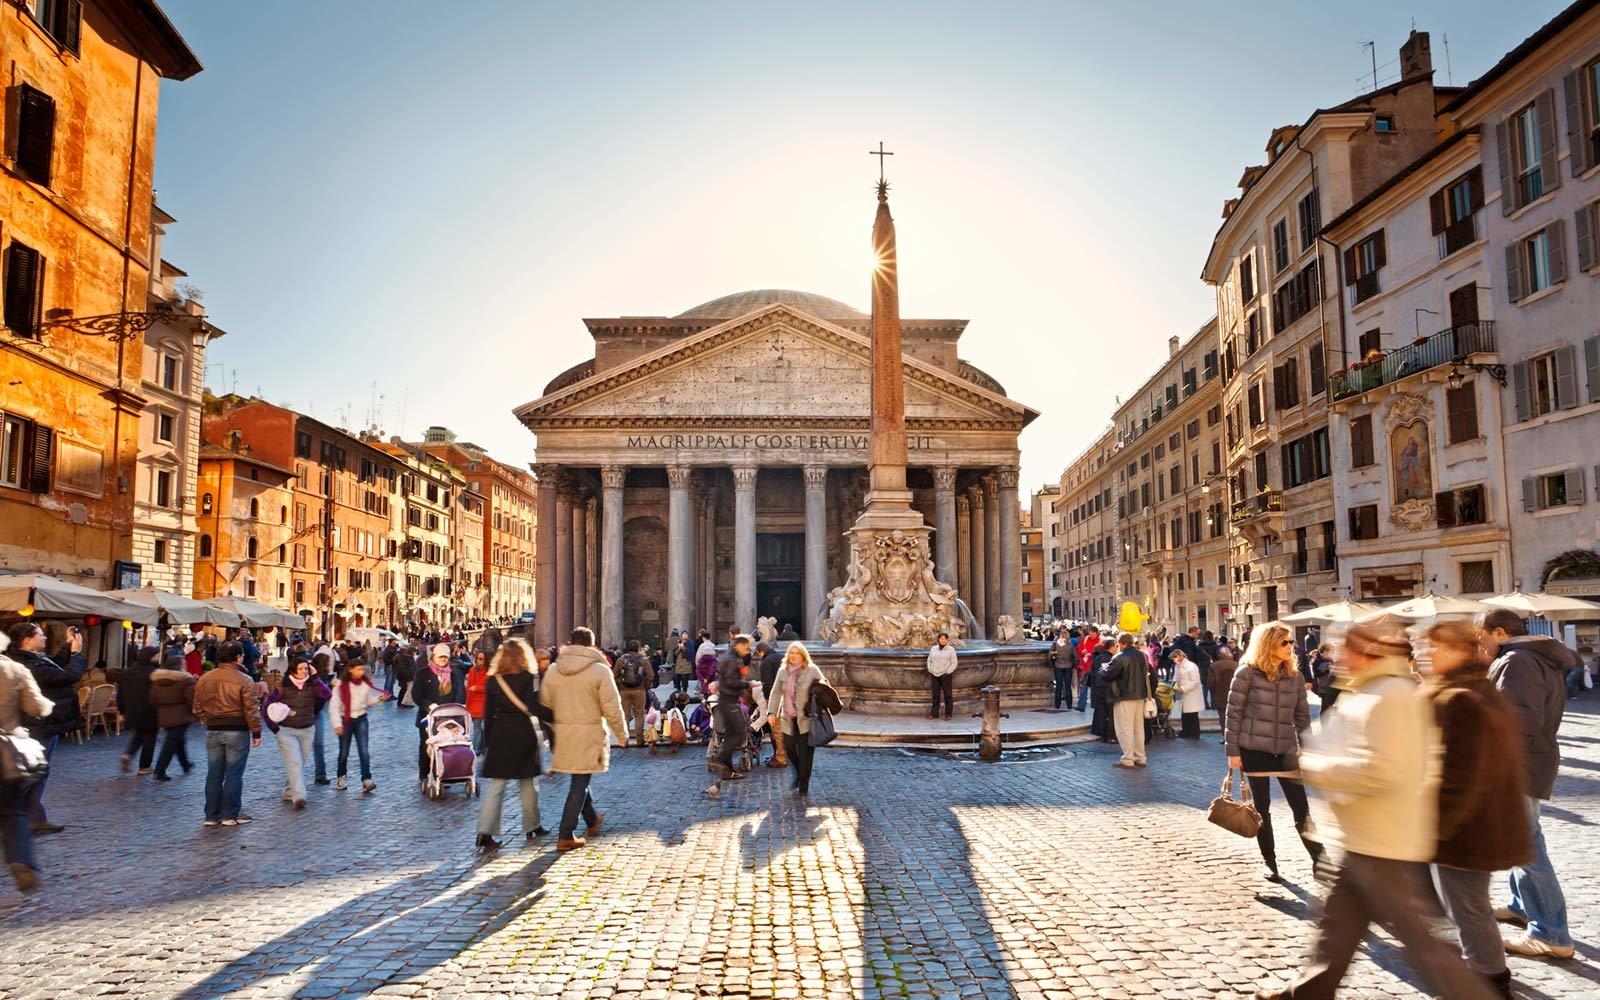 pantheon piazza della rotonda rome italy 13 TOPCITIESWB18